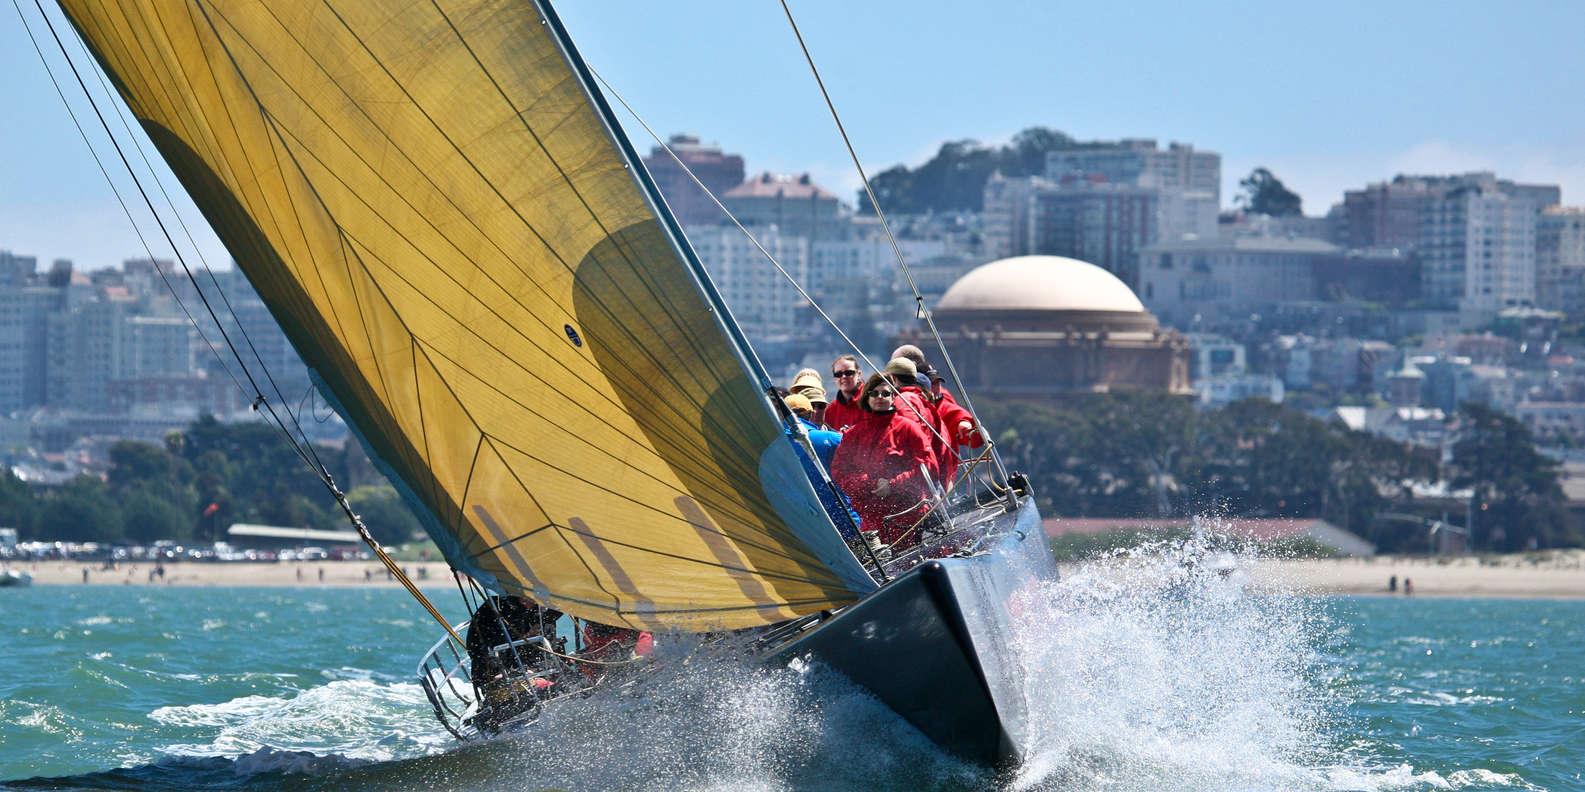 Ride a Racing Yacht